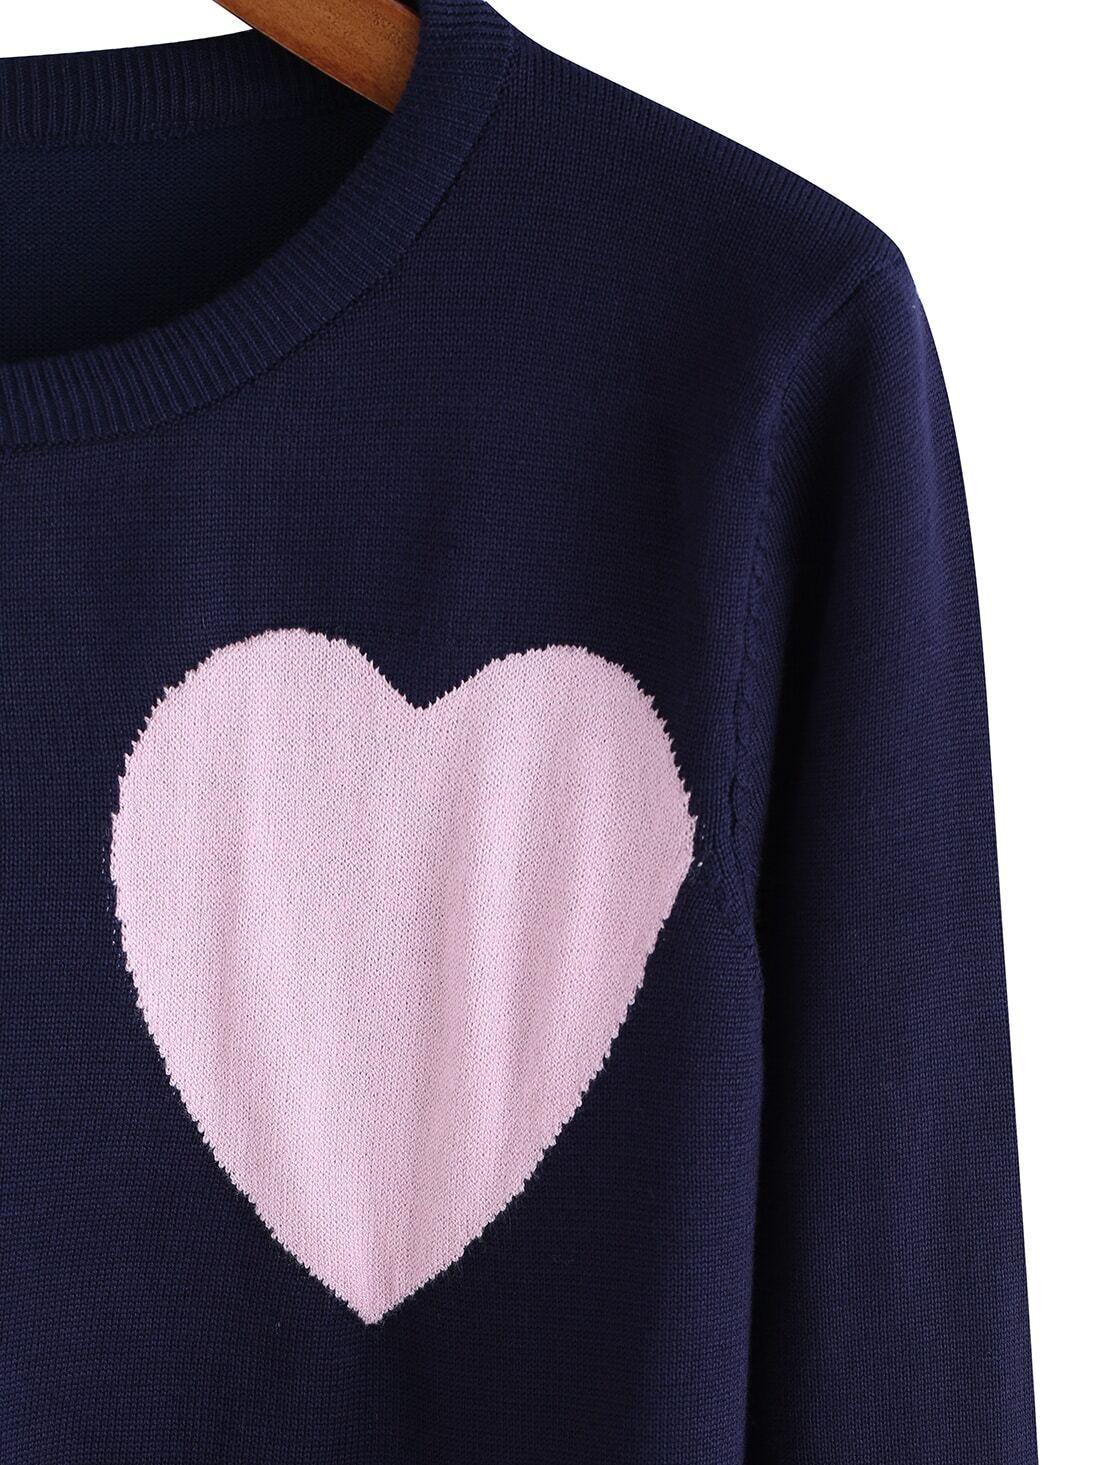 Round Neck Sweater Knitting Pattern : Blue Round Neck Heart Pattern Knit Sweater -SheIn(Sheinside)